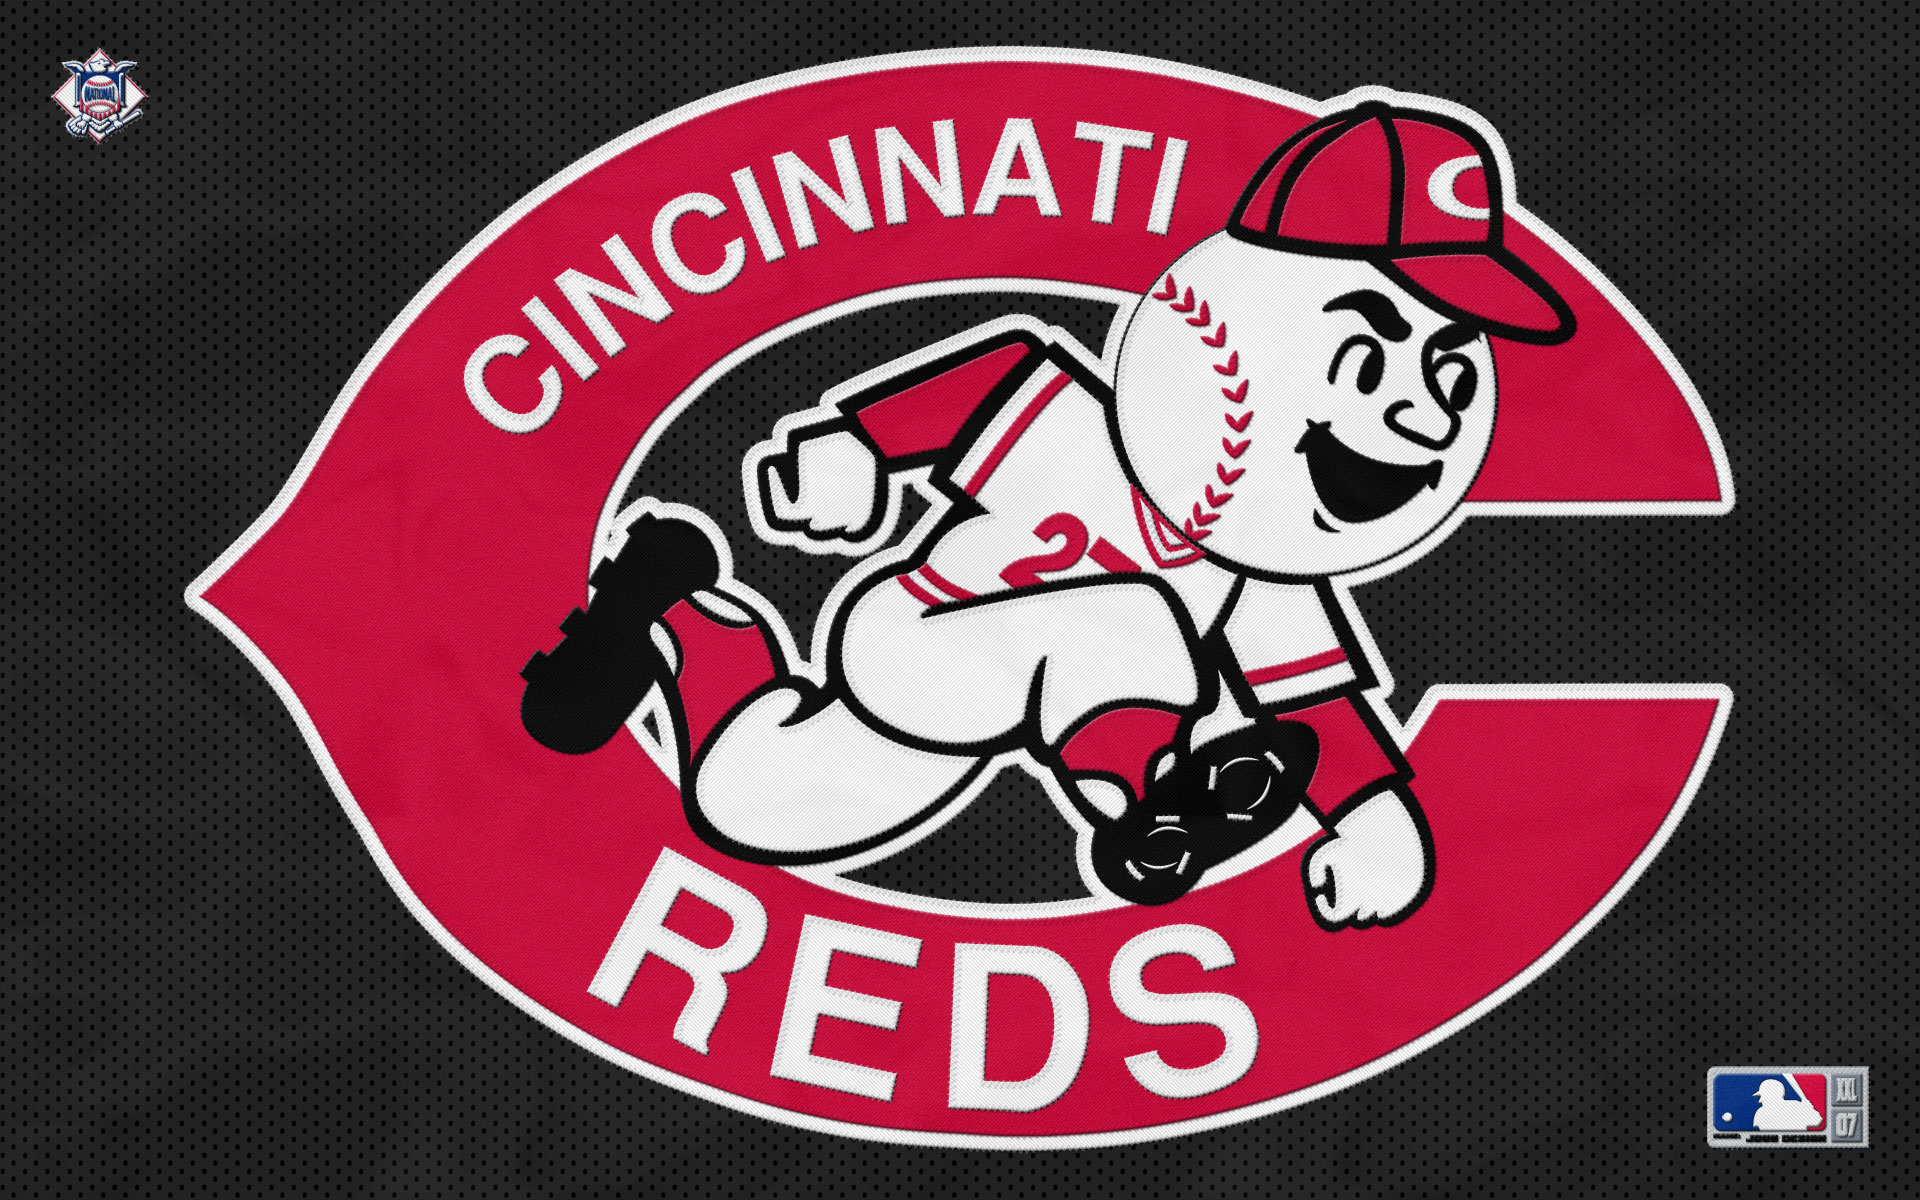 Cincinnati Reds HD Wallpaper HD Wallpapers HD Backgrounds 1920x1200